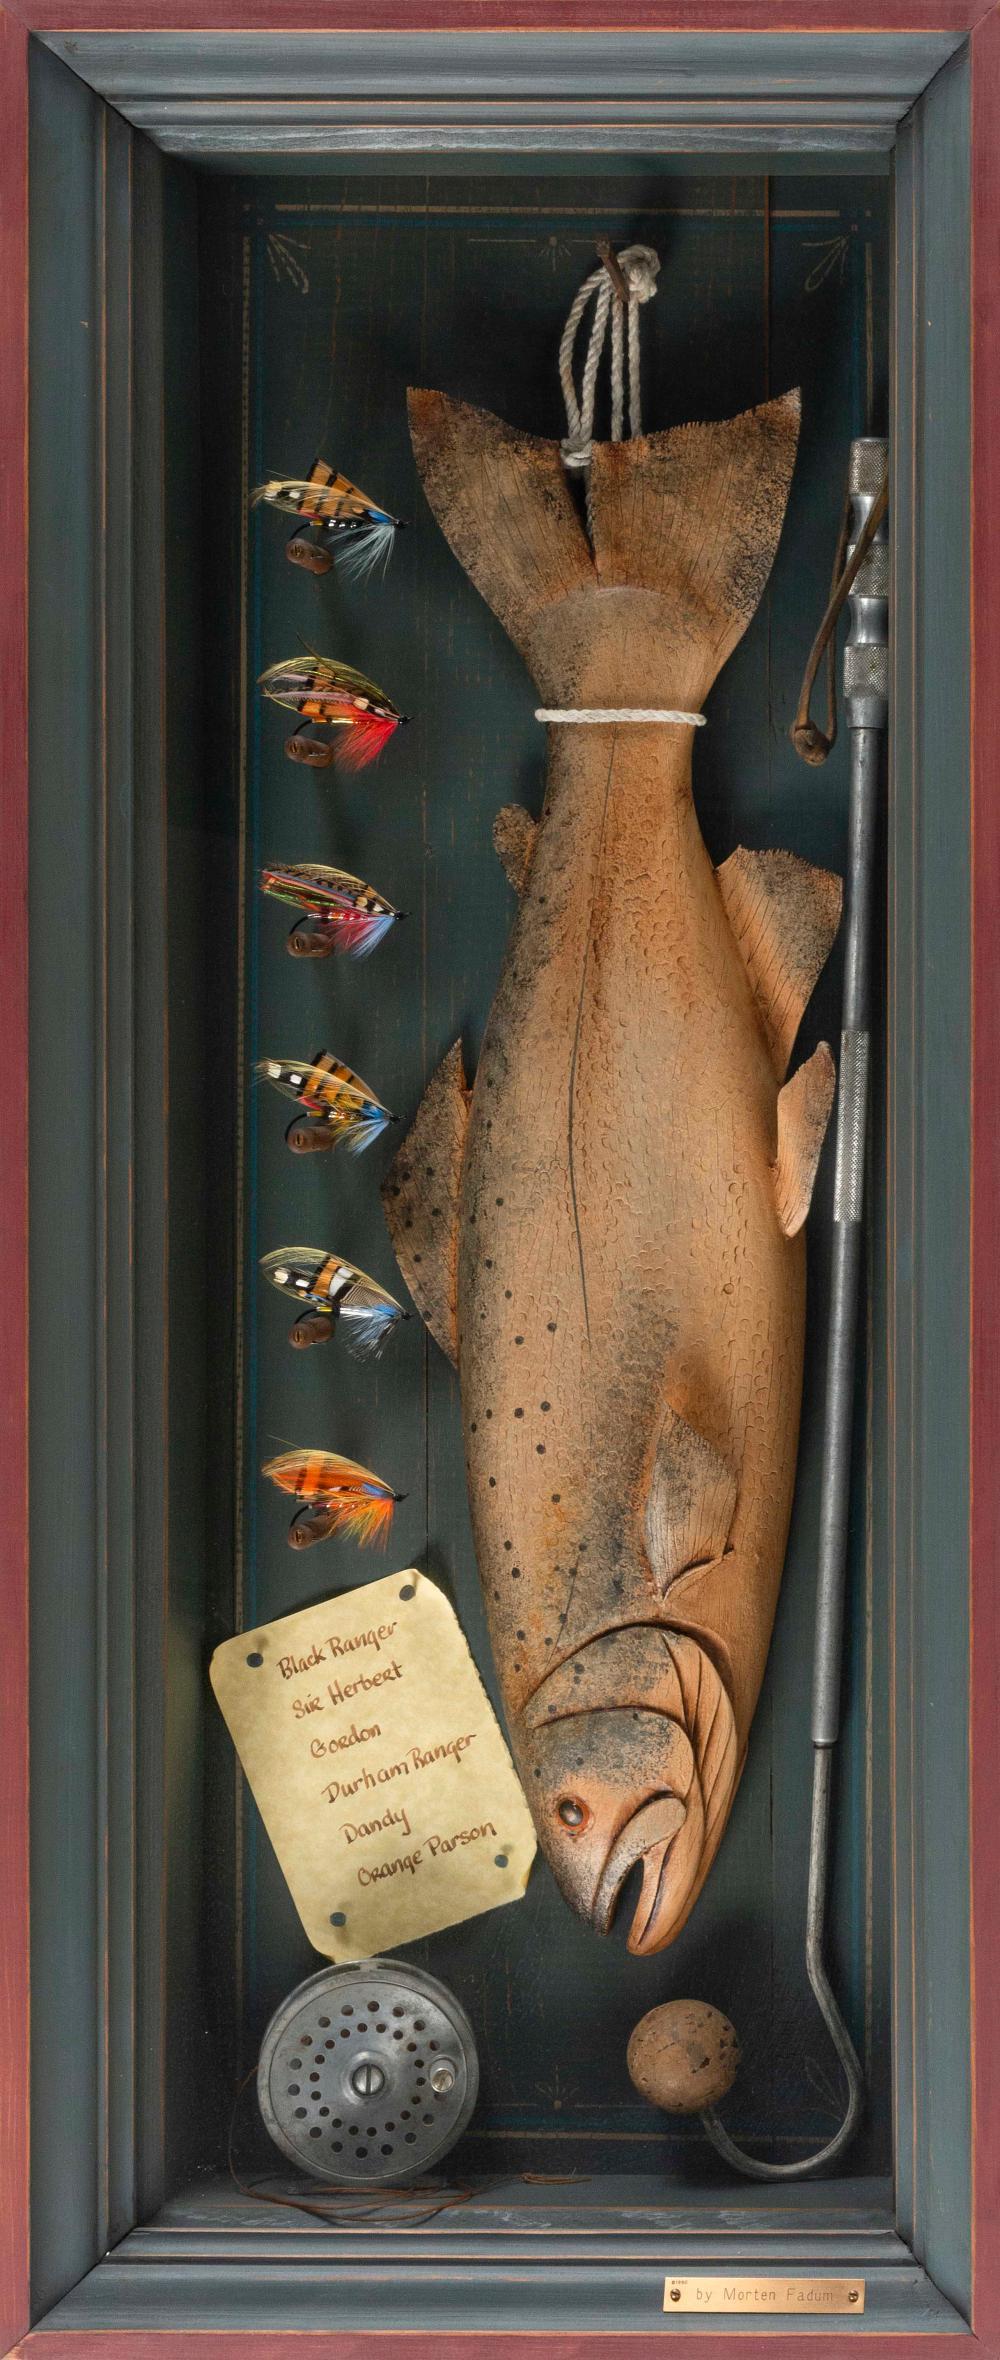 MORTEN FADUM, Illinois/Colorado, Contemporary, Shadow box still life of a salmon, fishing rod and flies.